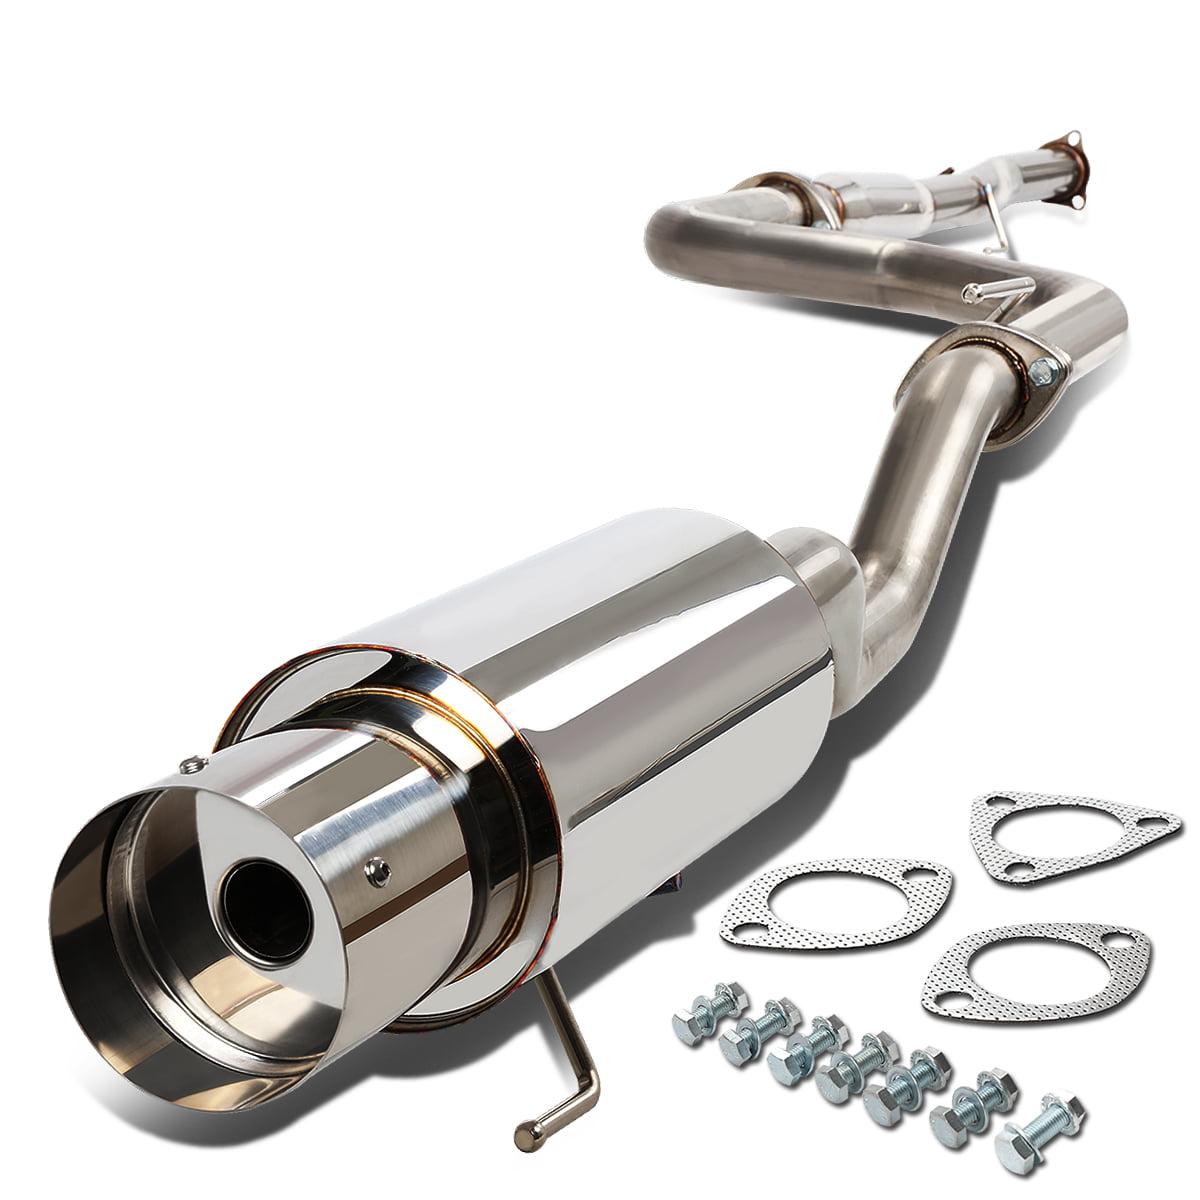 "For 92-00 Honda Civic EG 2/4-Door 4.5"" Muffler Tip Catback Exhaust System 93 94 95 96 97 98 99"